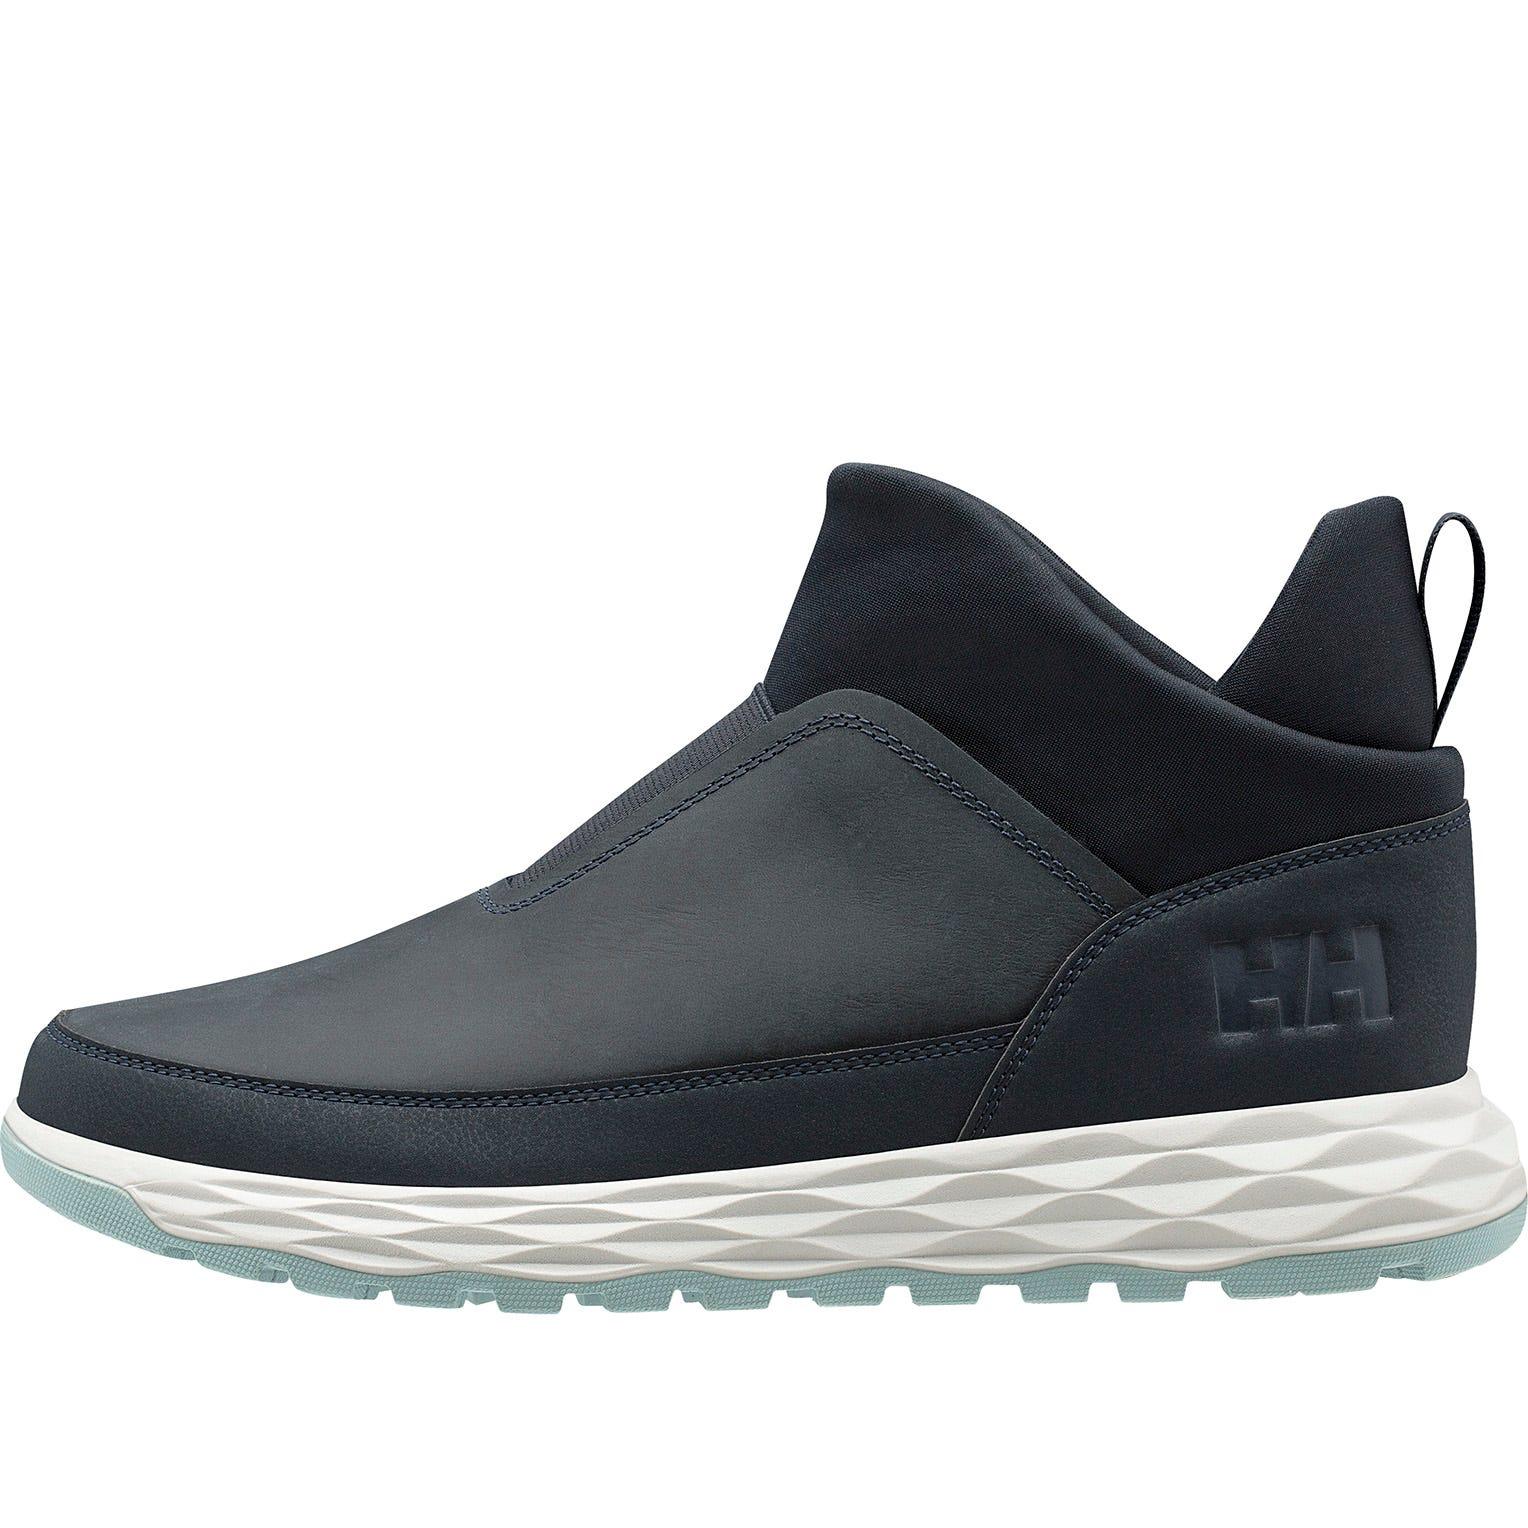 Helly Hansen W Cora Womens Casual Shoe Navy 37/6